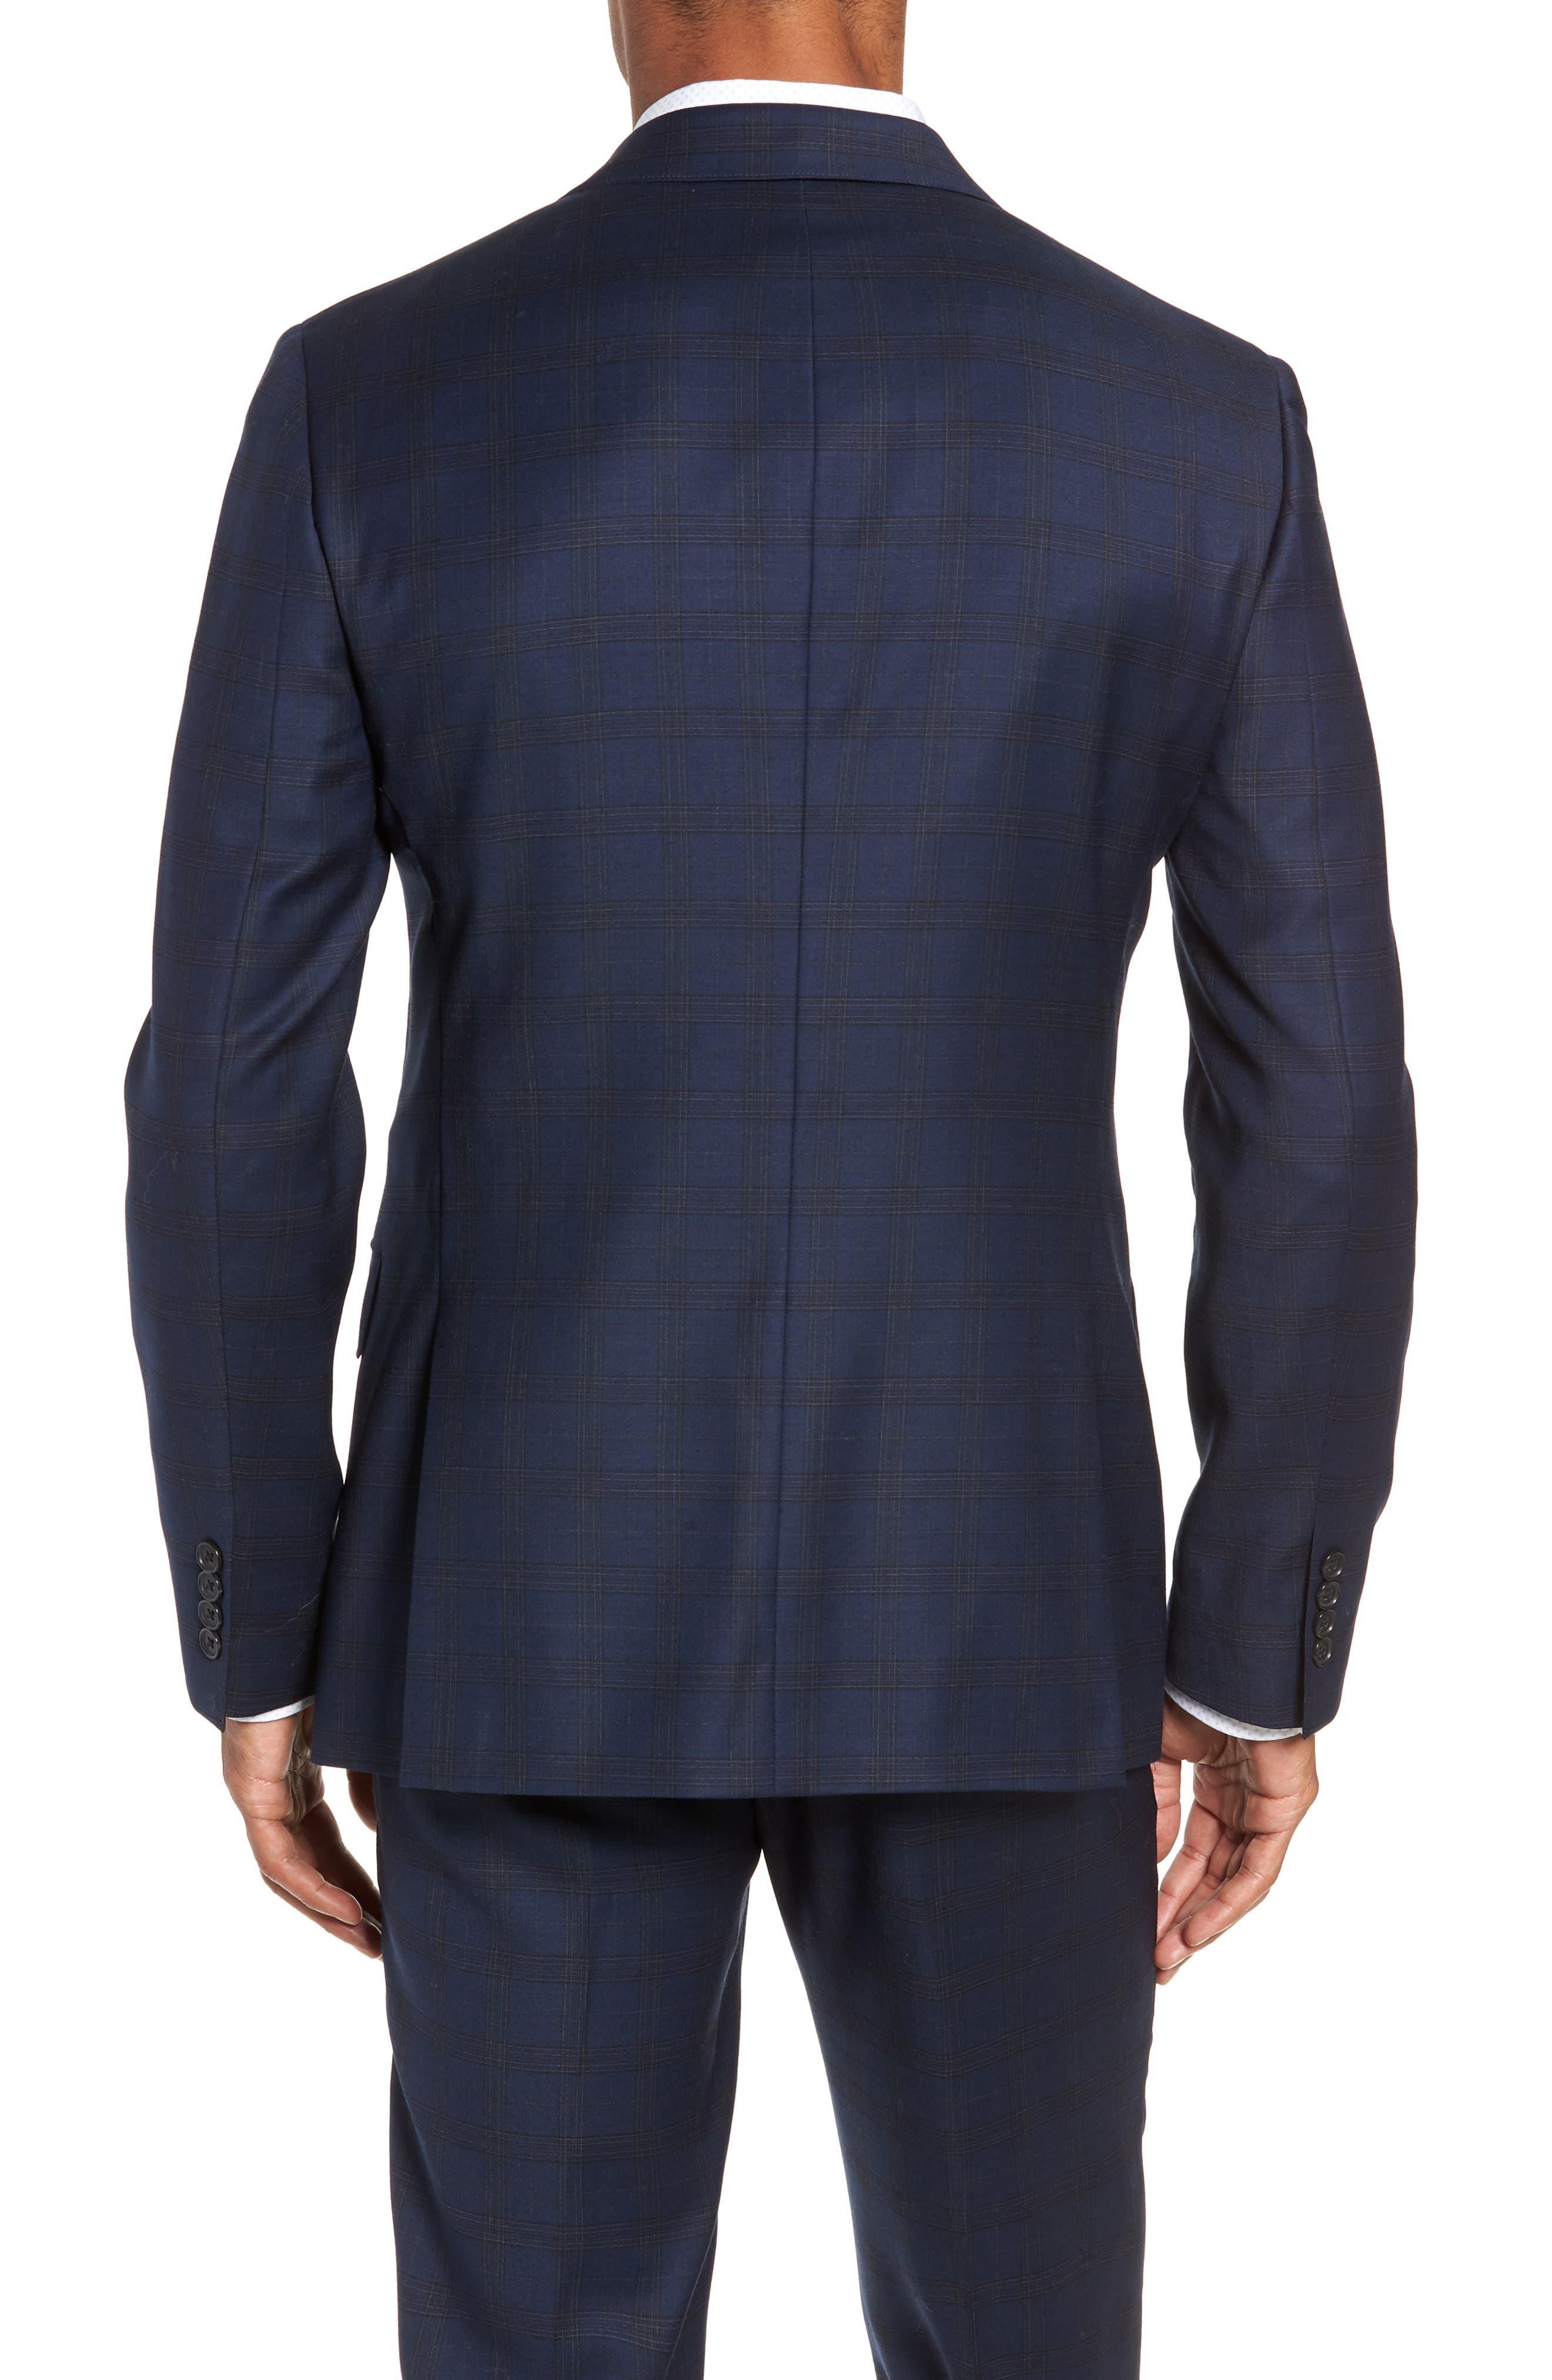 Jetsetter Slim Fit Stretch Wool Sport Coat,                             Main thumbnail 1, color,                             SUBTLE NAVY PLAID